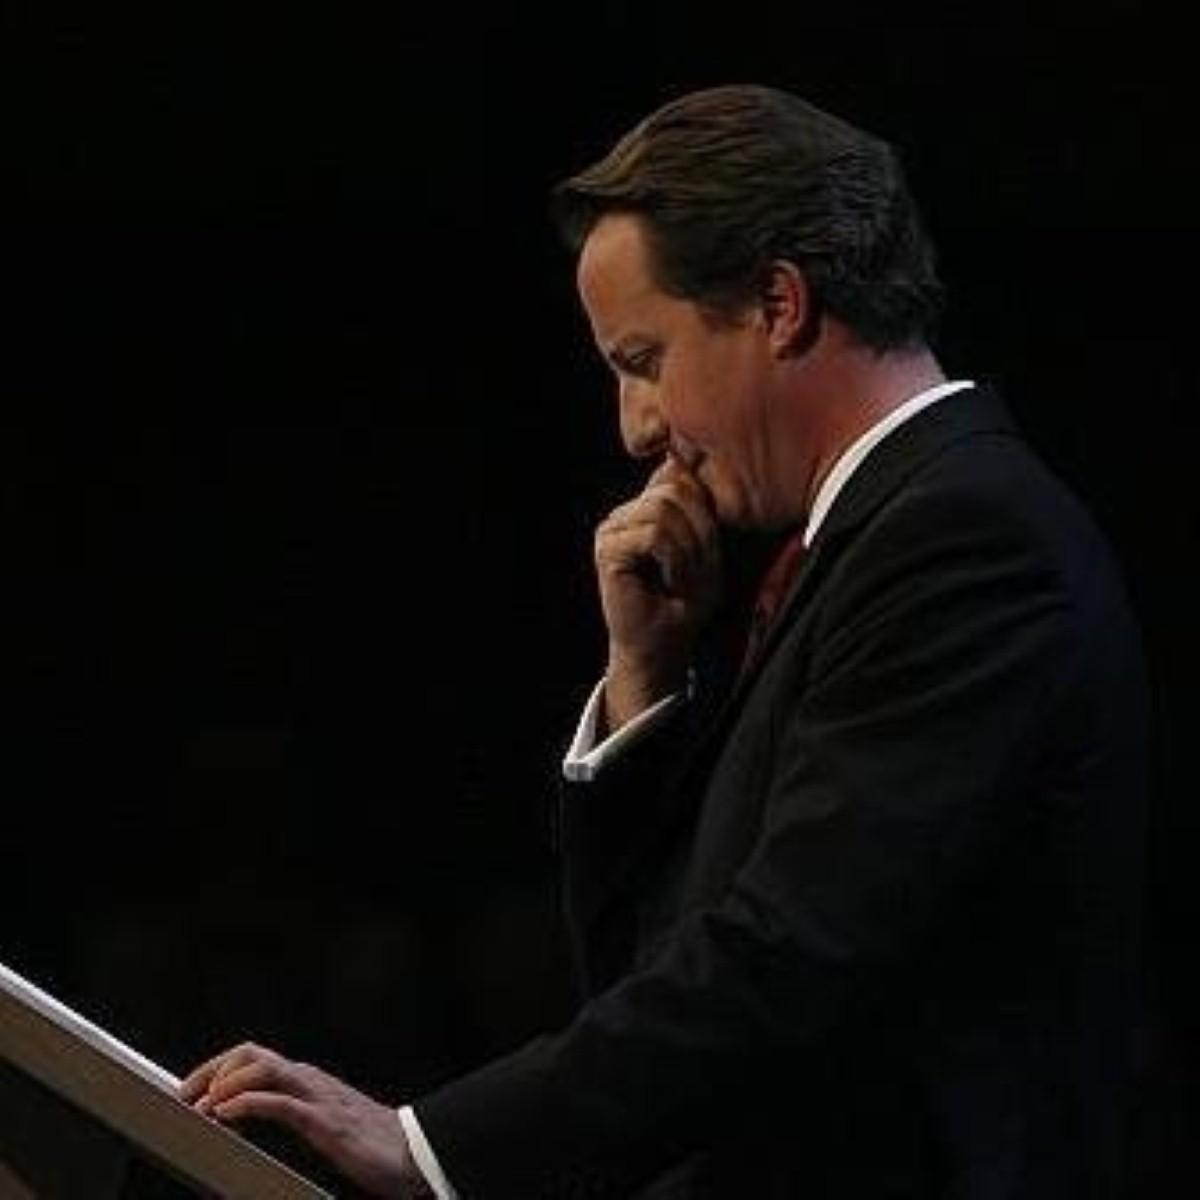 Cameron makes peerages 'smear'